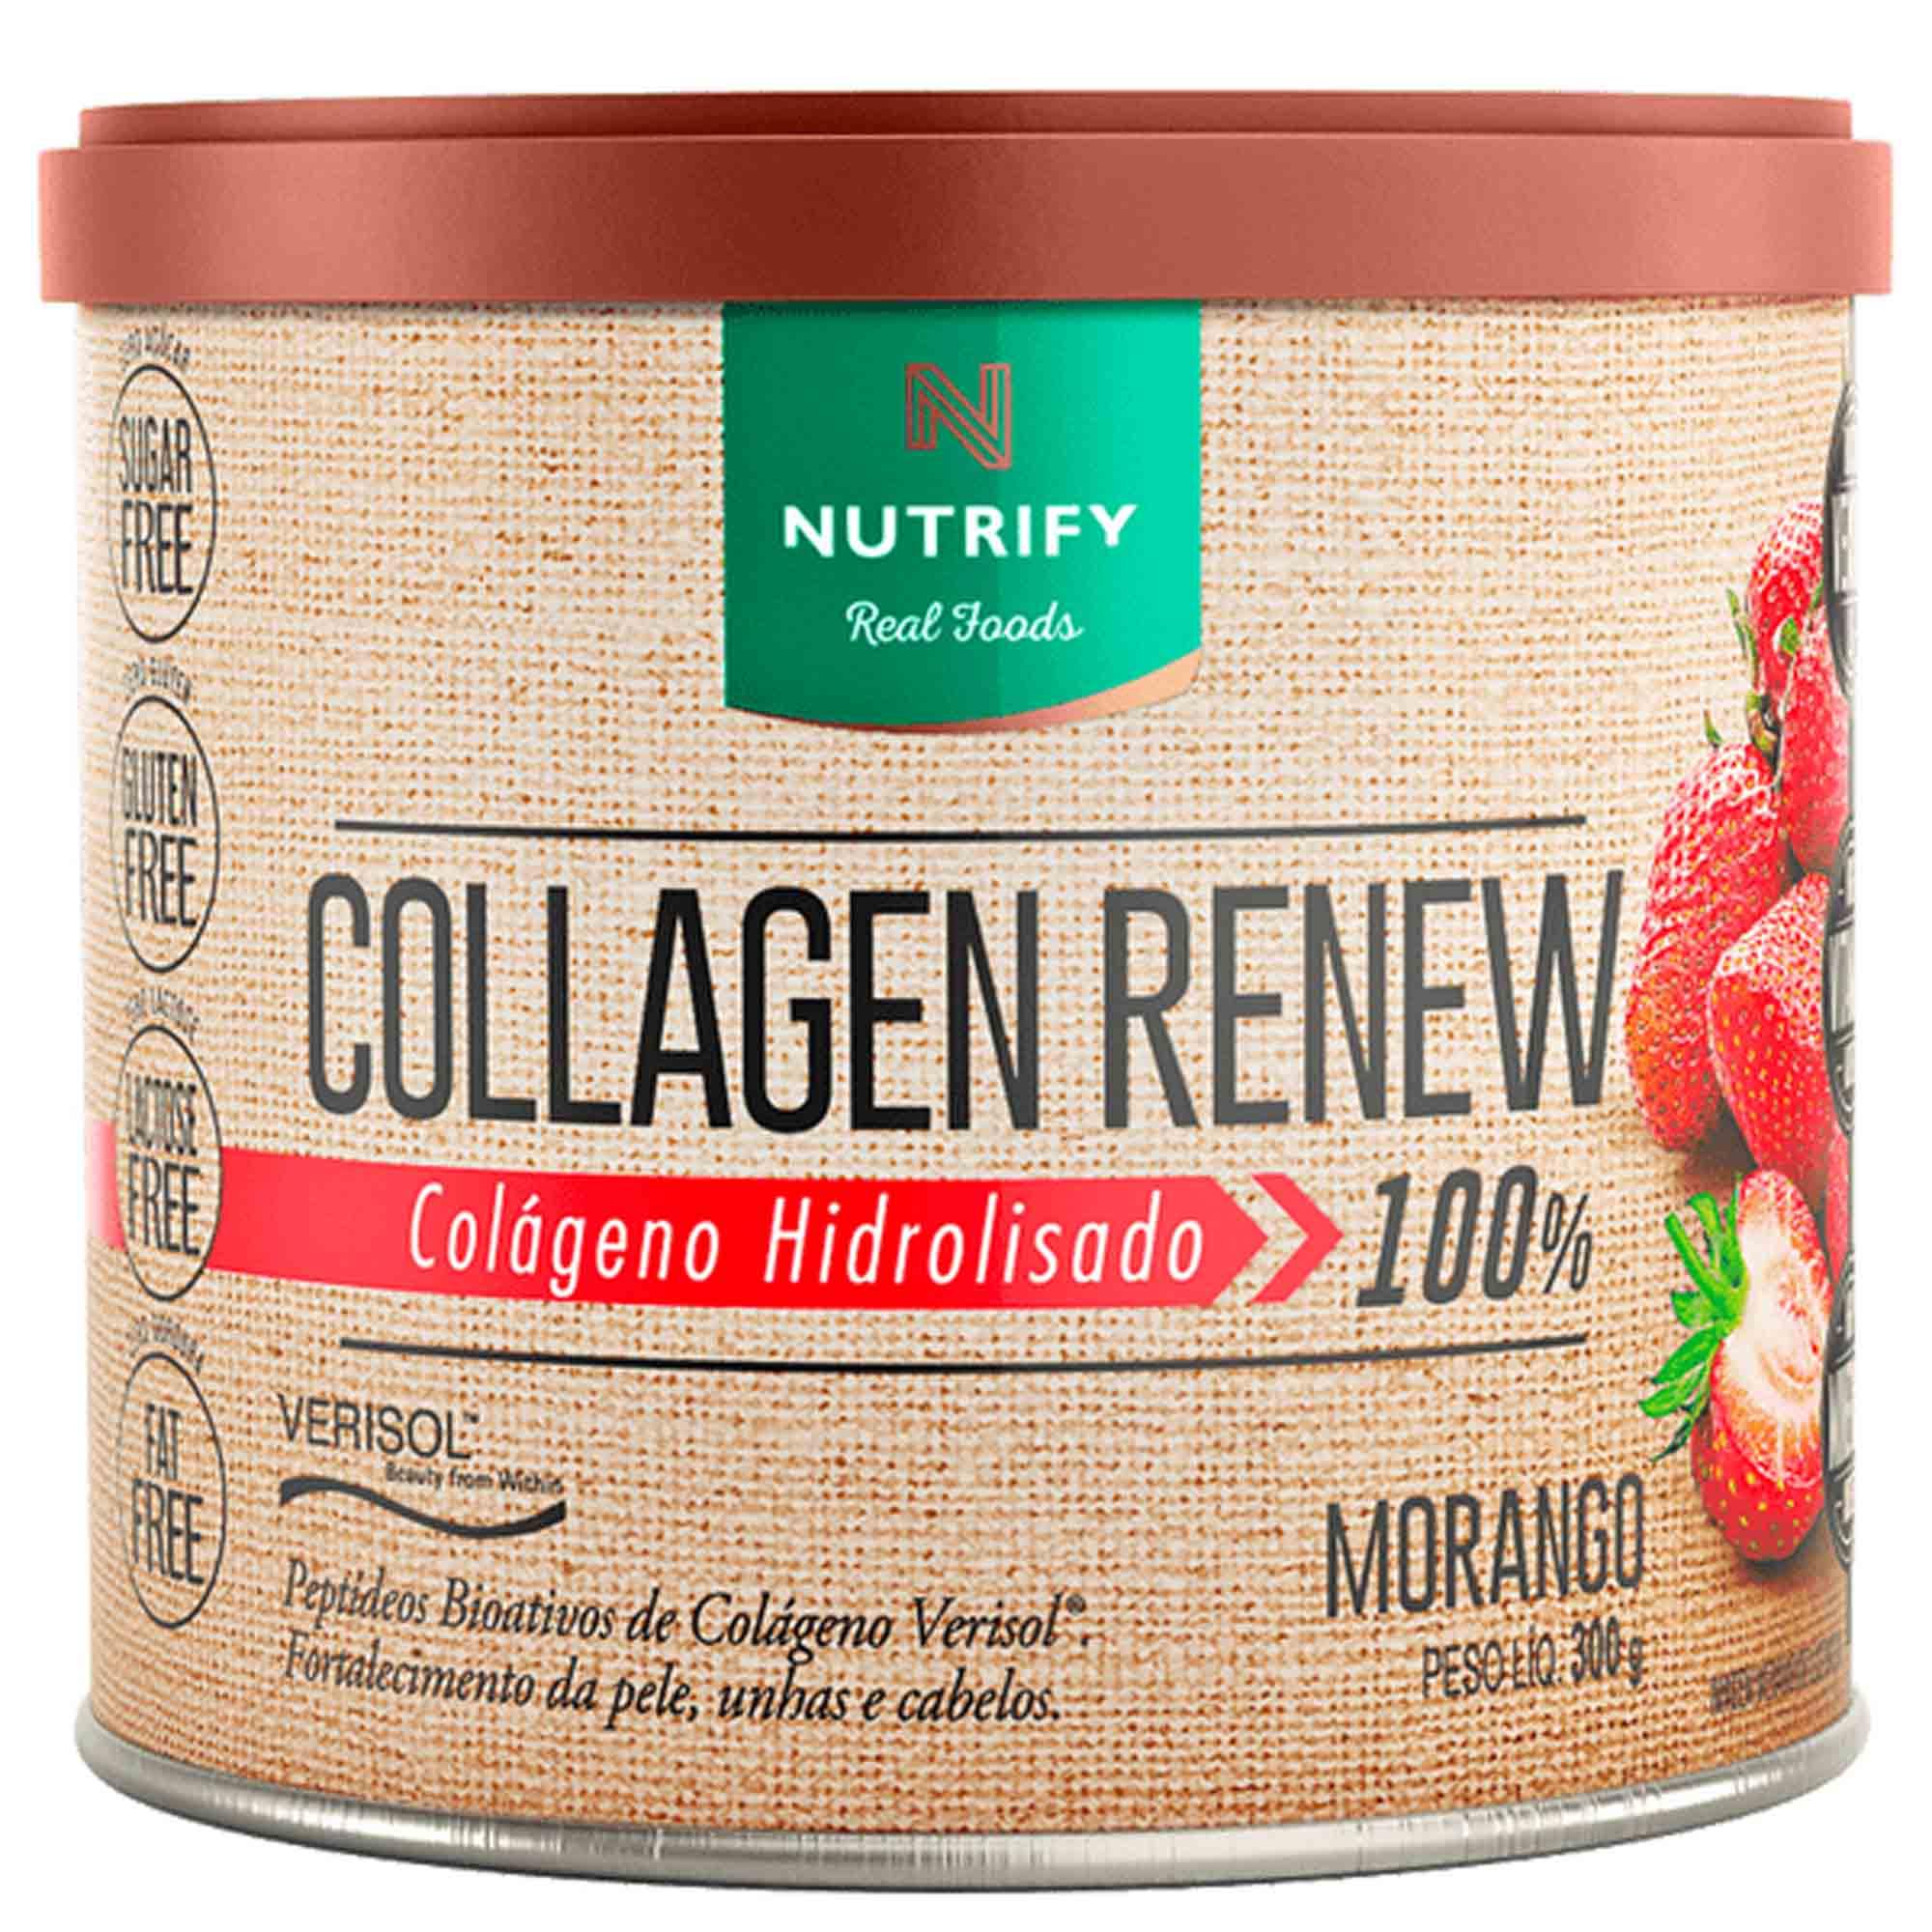 Collagen Renew sabor Morango 300g Nutrify